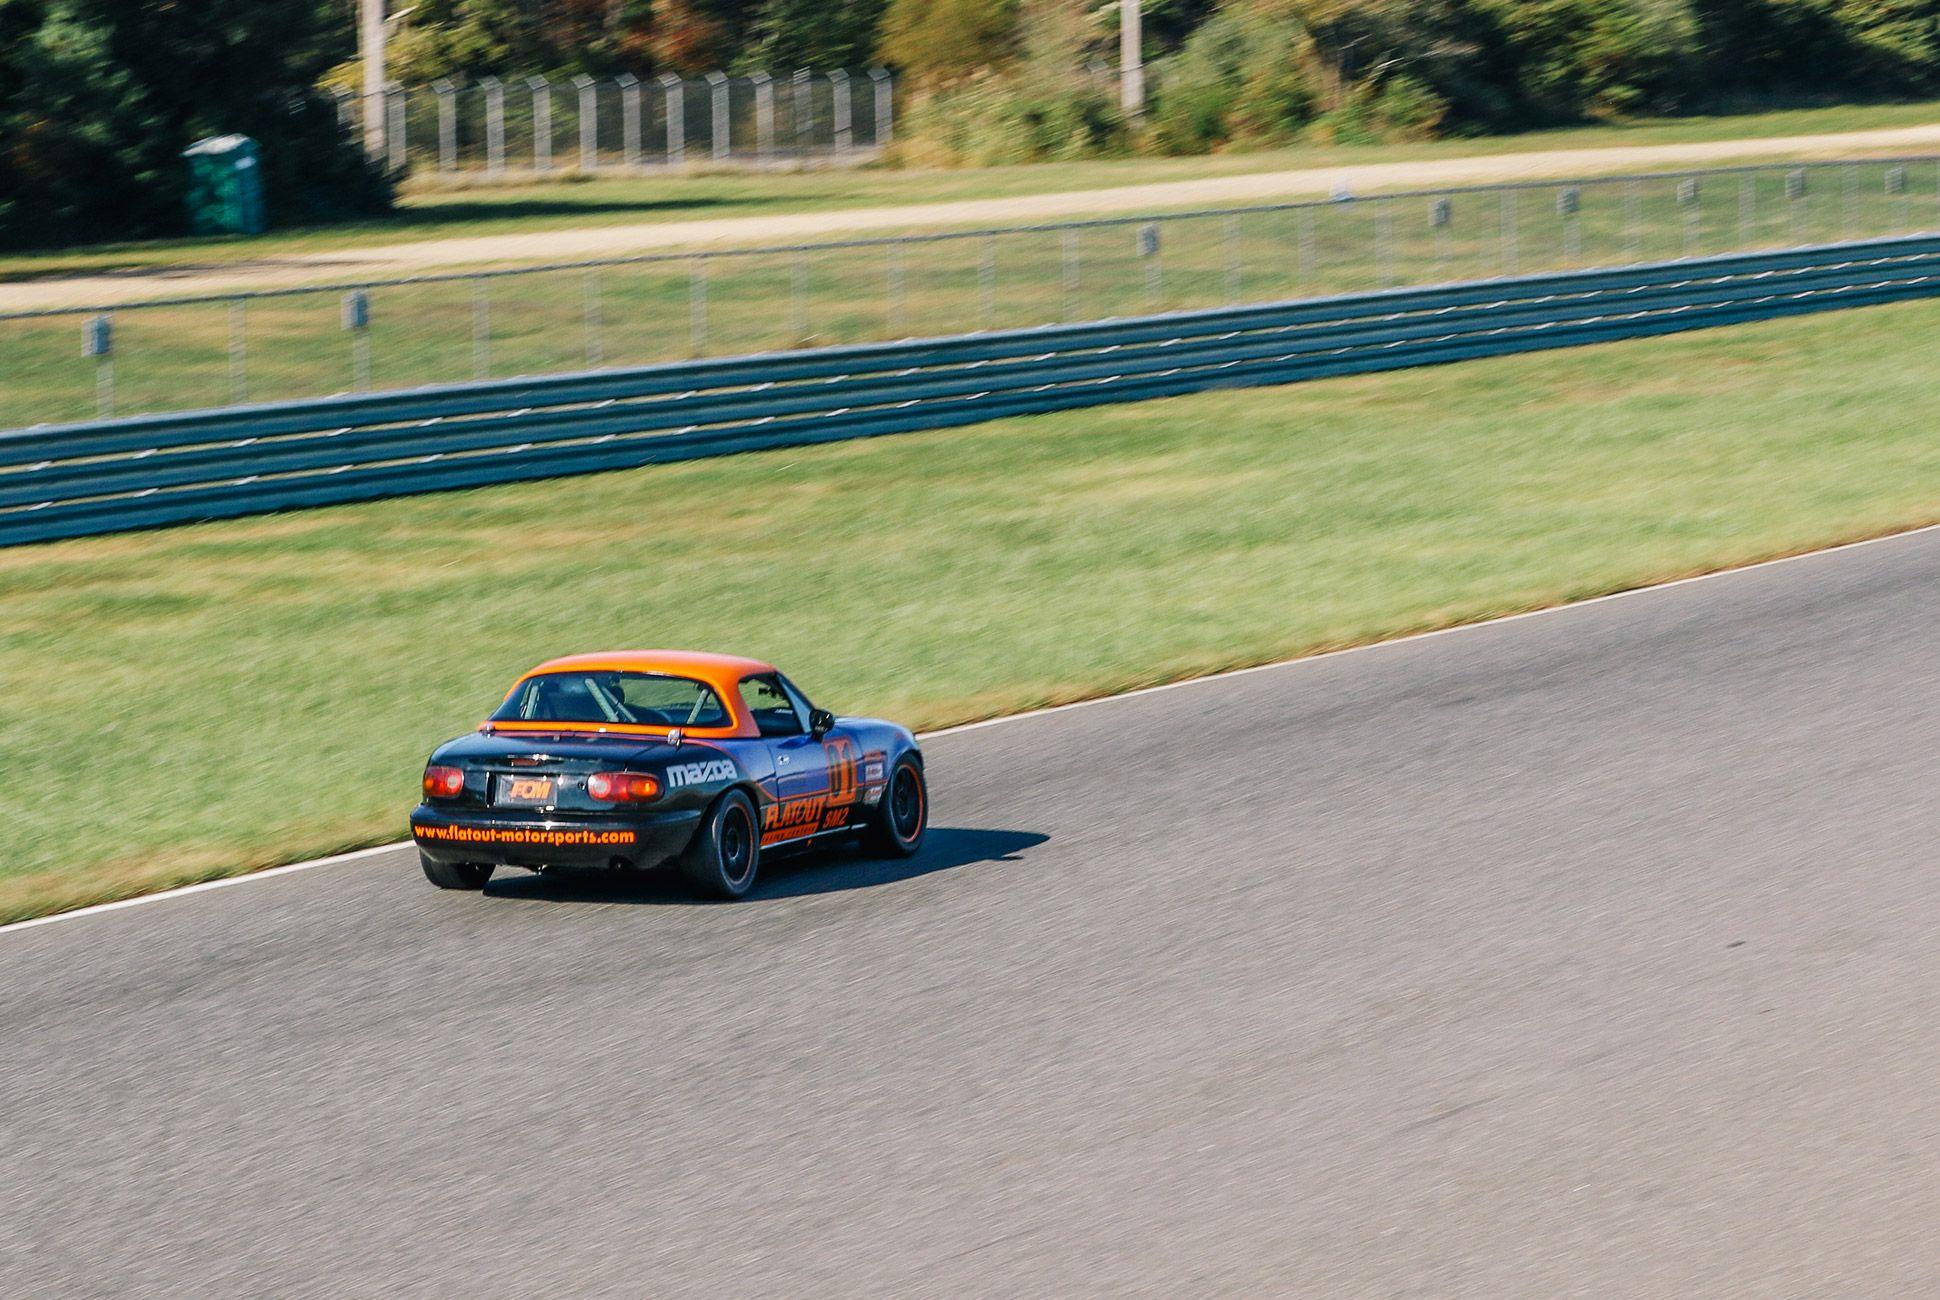 Mazda-Miata-The-Best-Vintage-Sportscar-gear-patrol-6